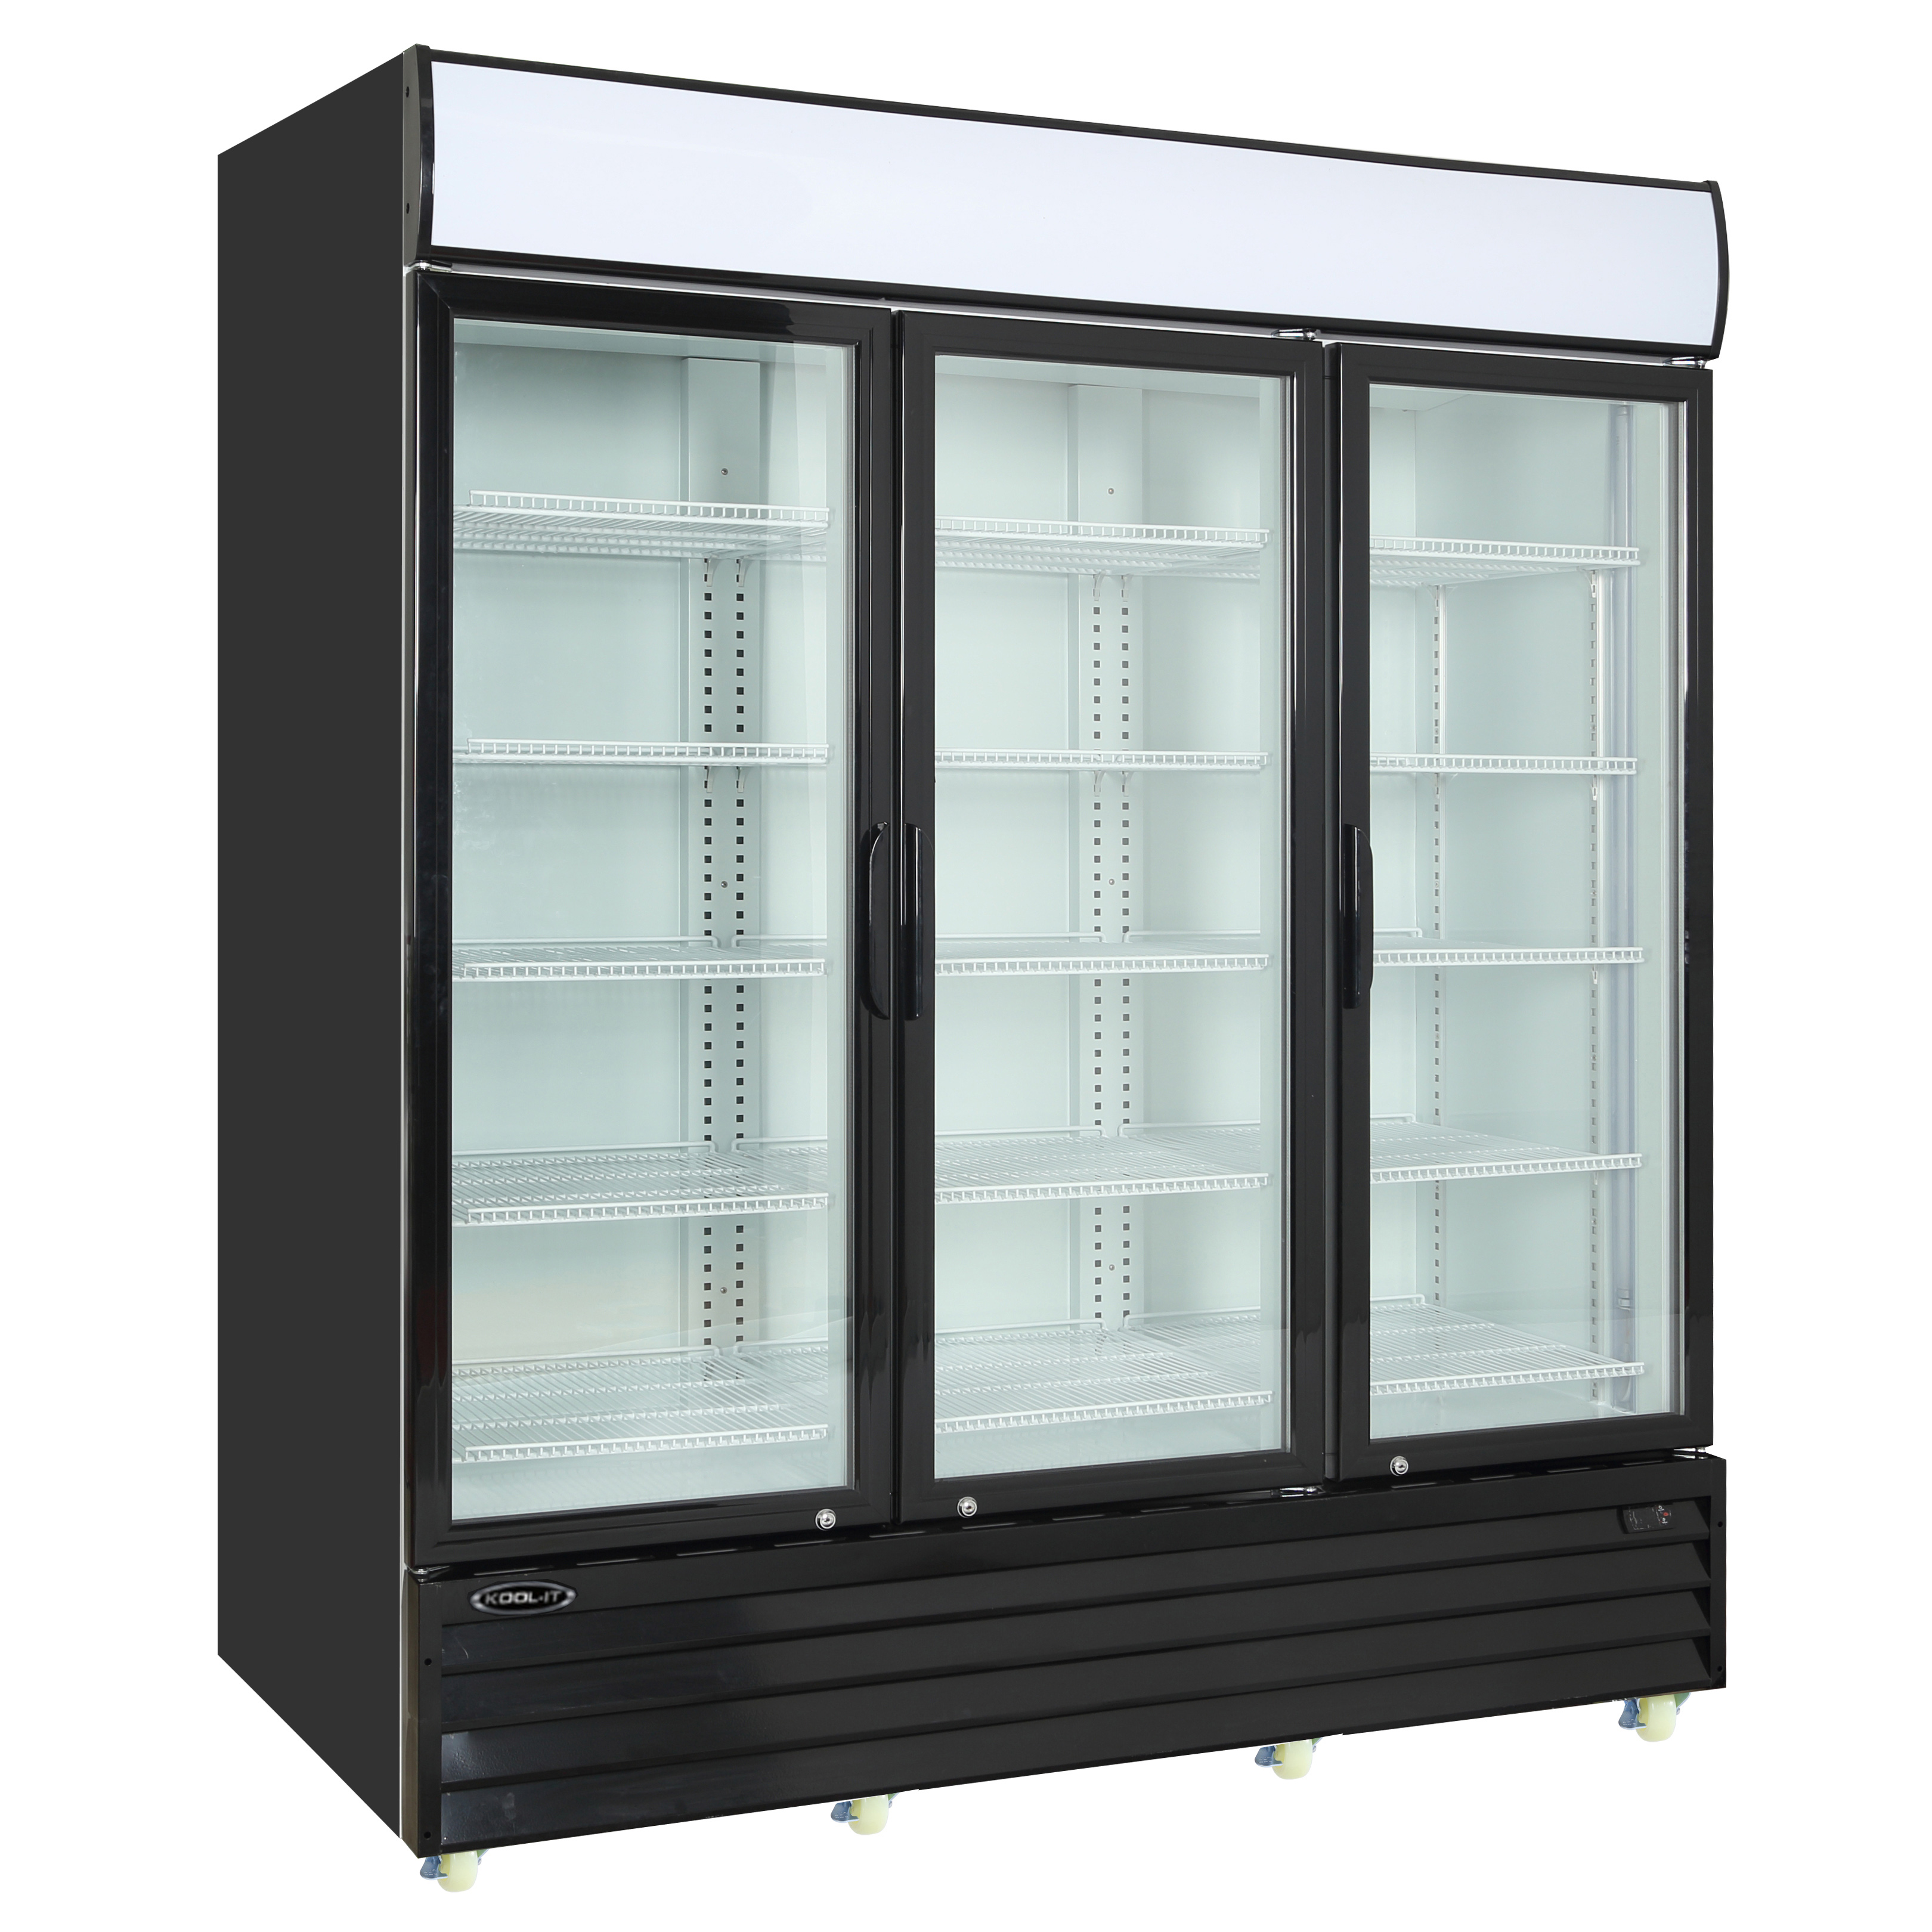 MVP Group LLC KGM-75 refrigerator, merchandiser